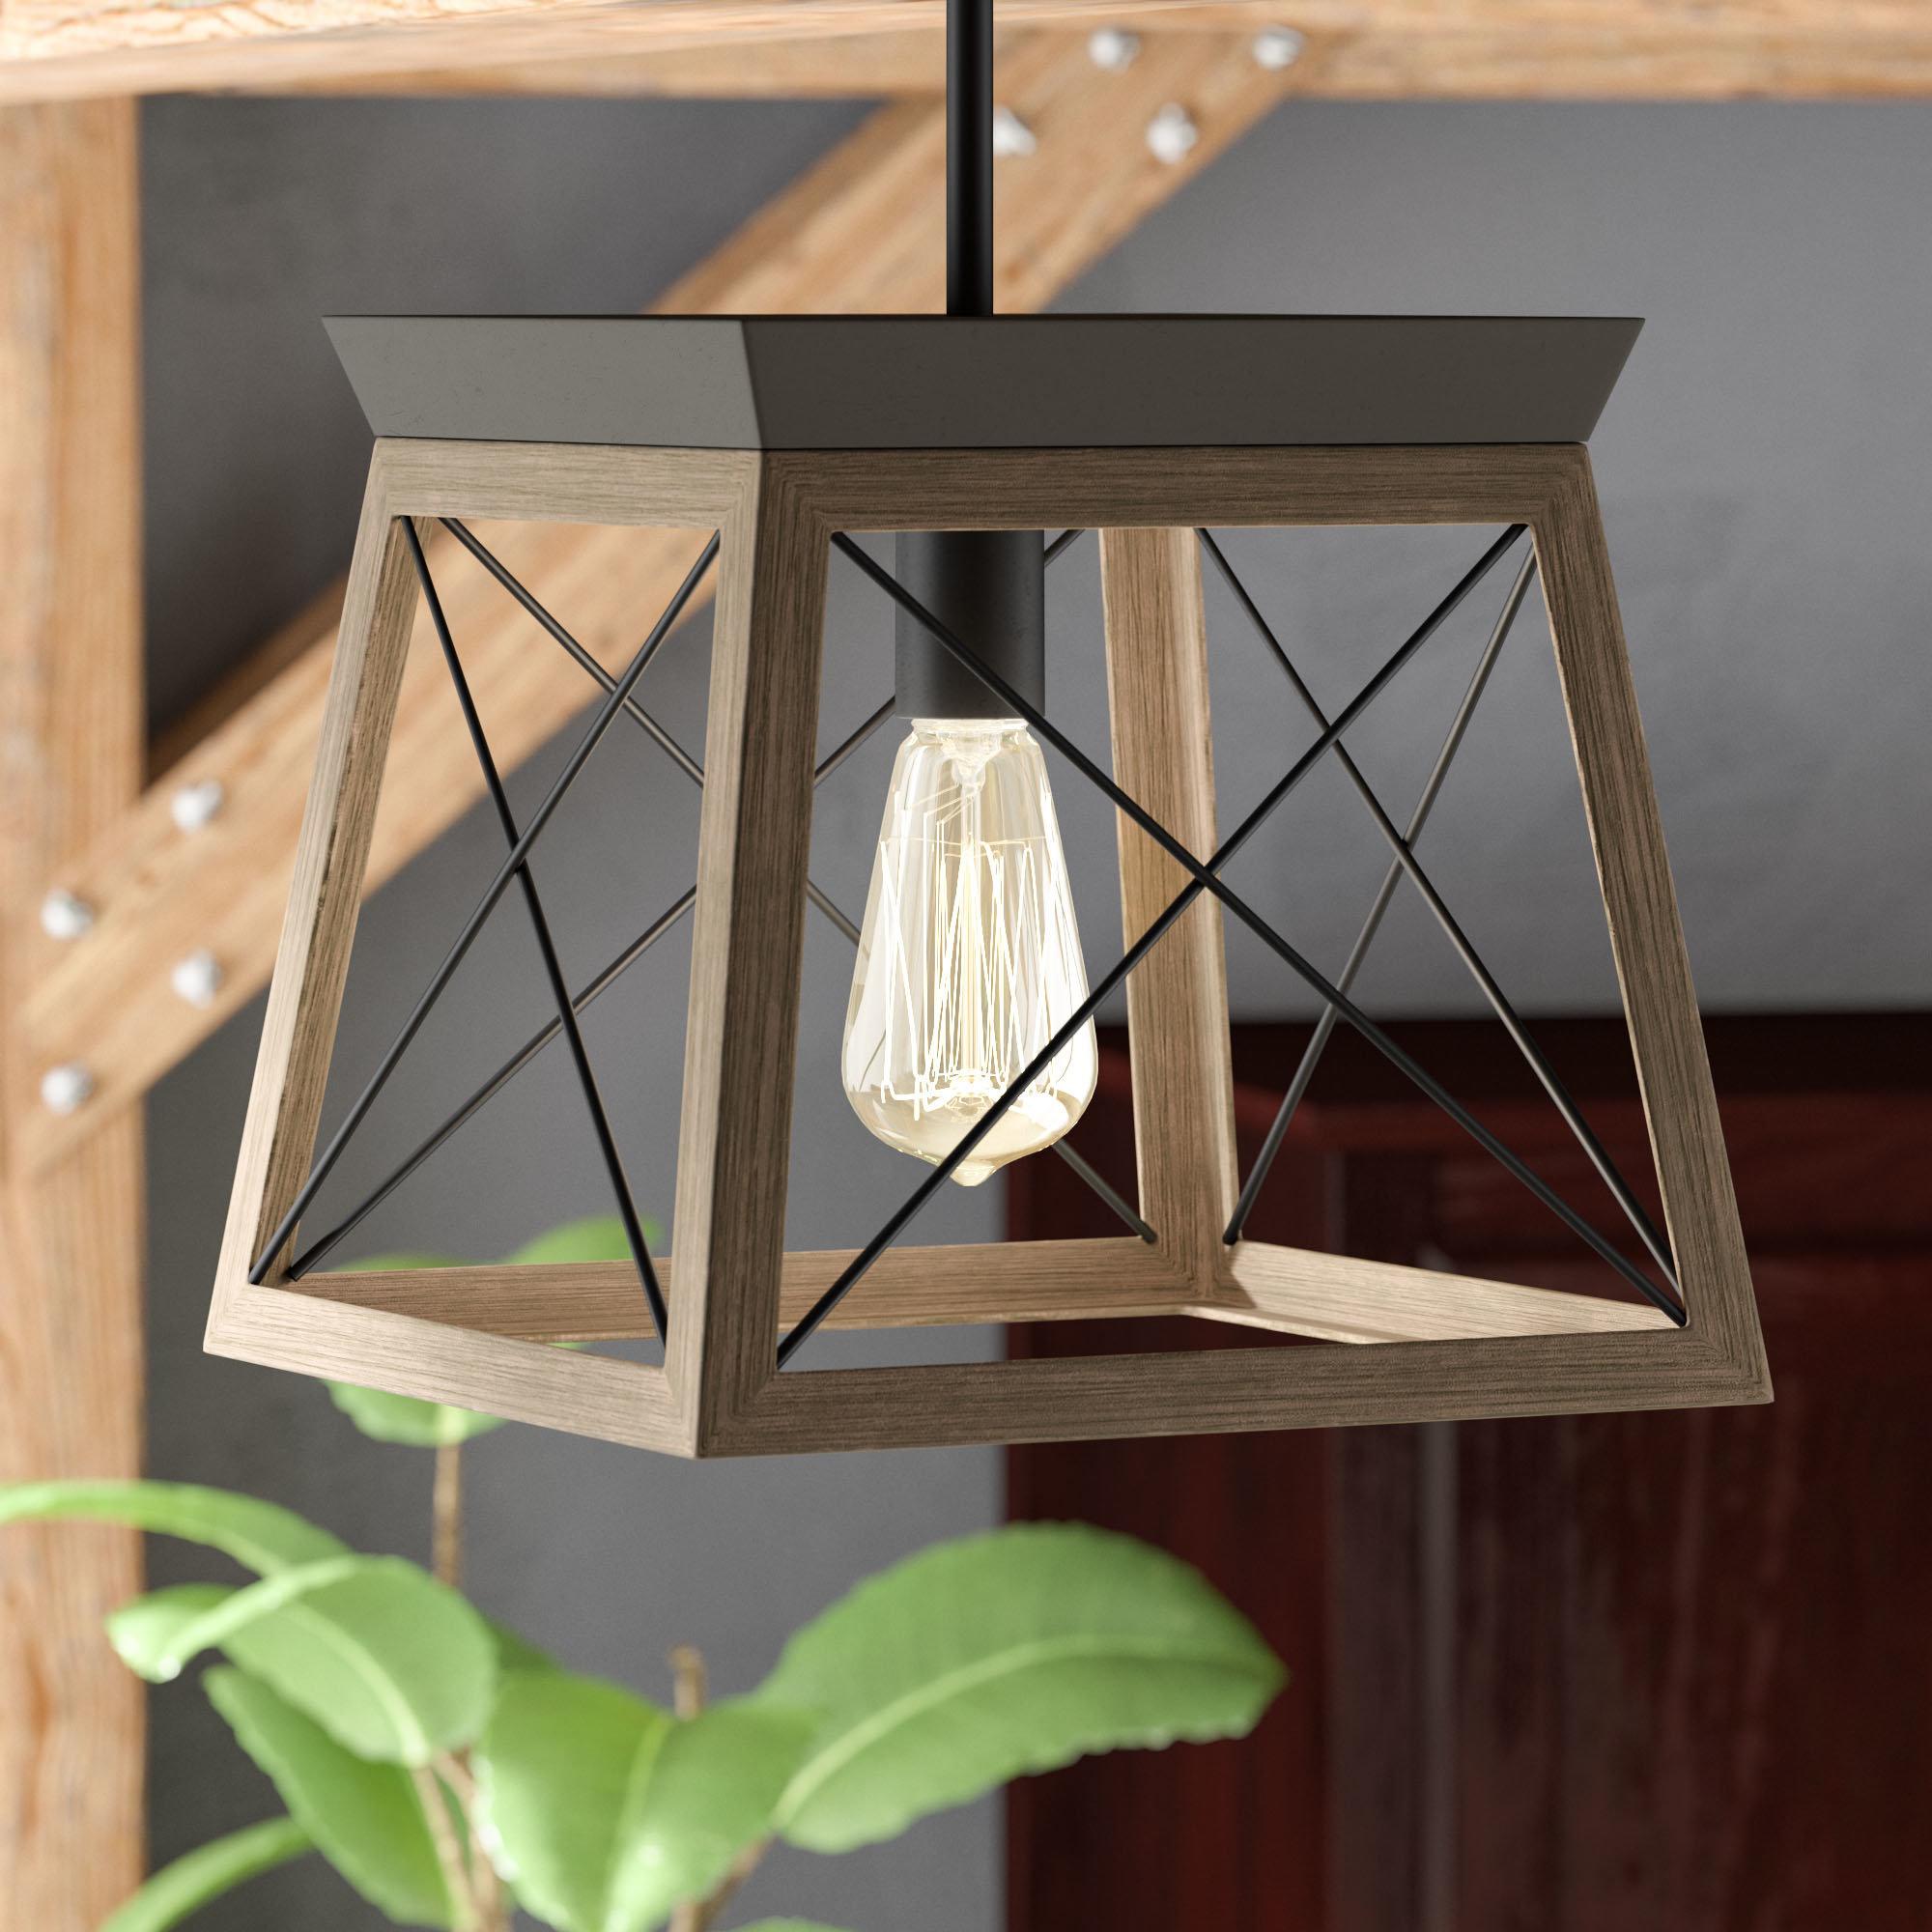 Louanne 3 Light Lantern Geometric Pendants Within 2019 Delon 1 Light Lantern Geometric Pendant (View 12 of 20)